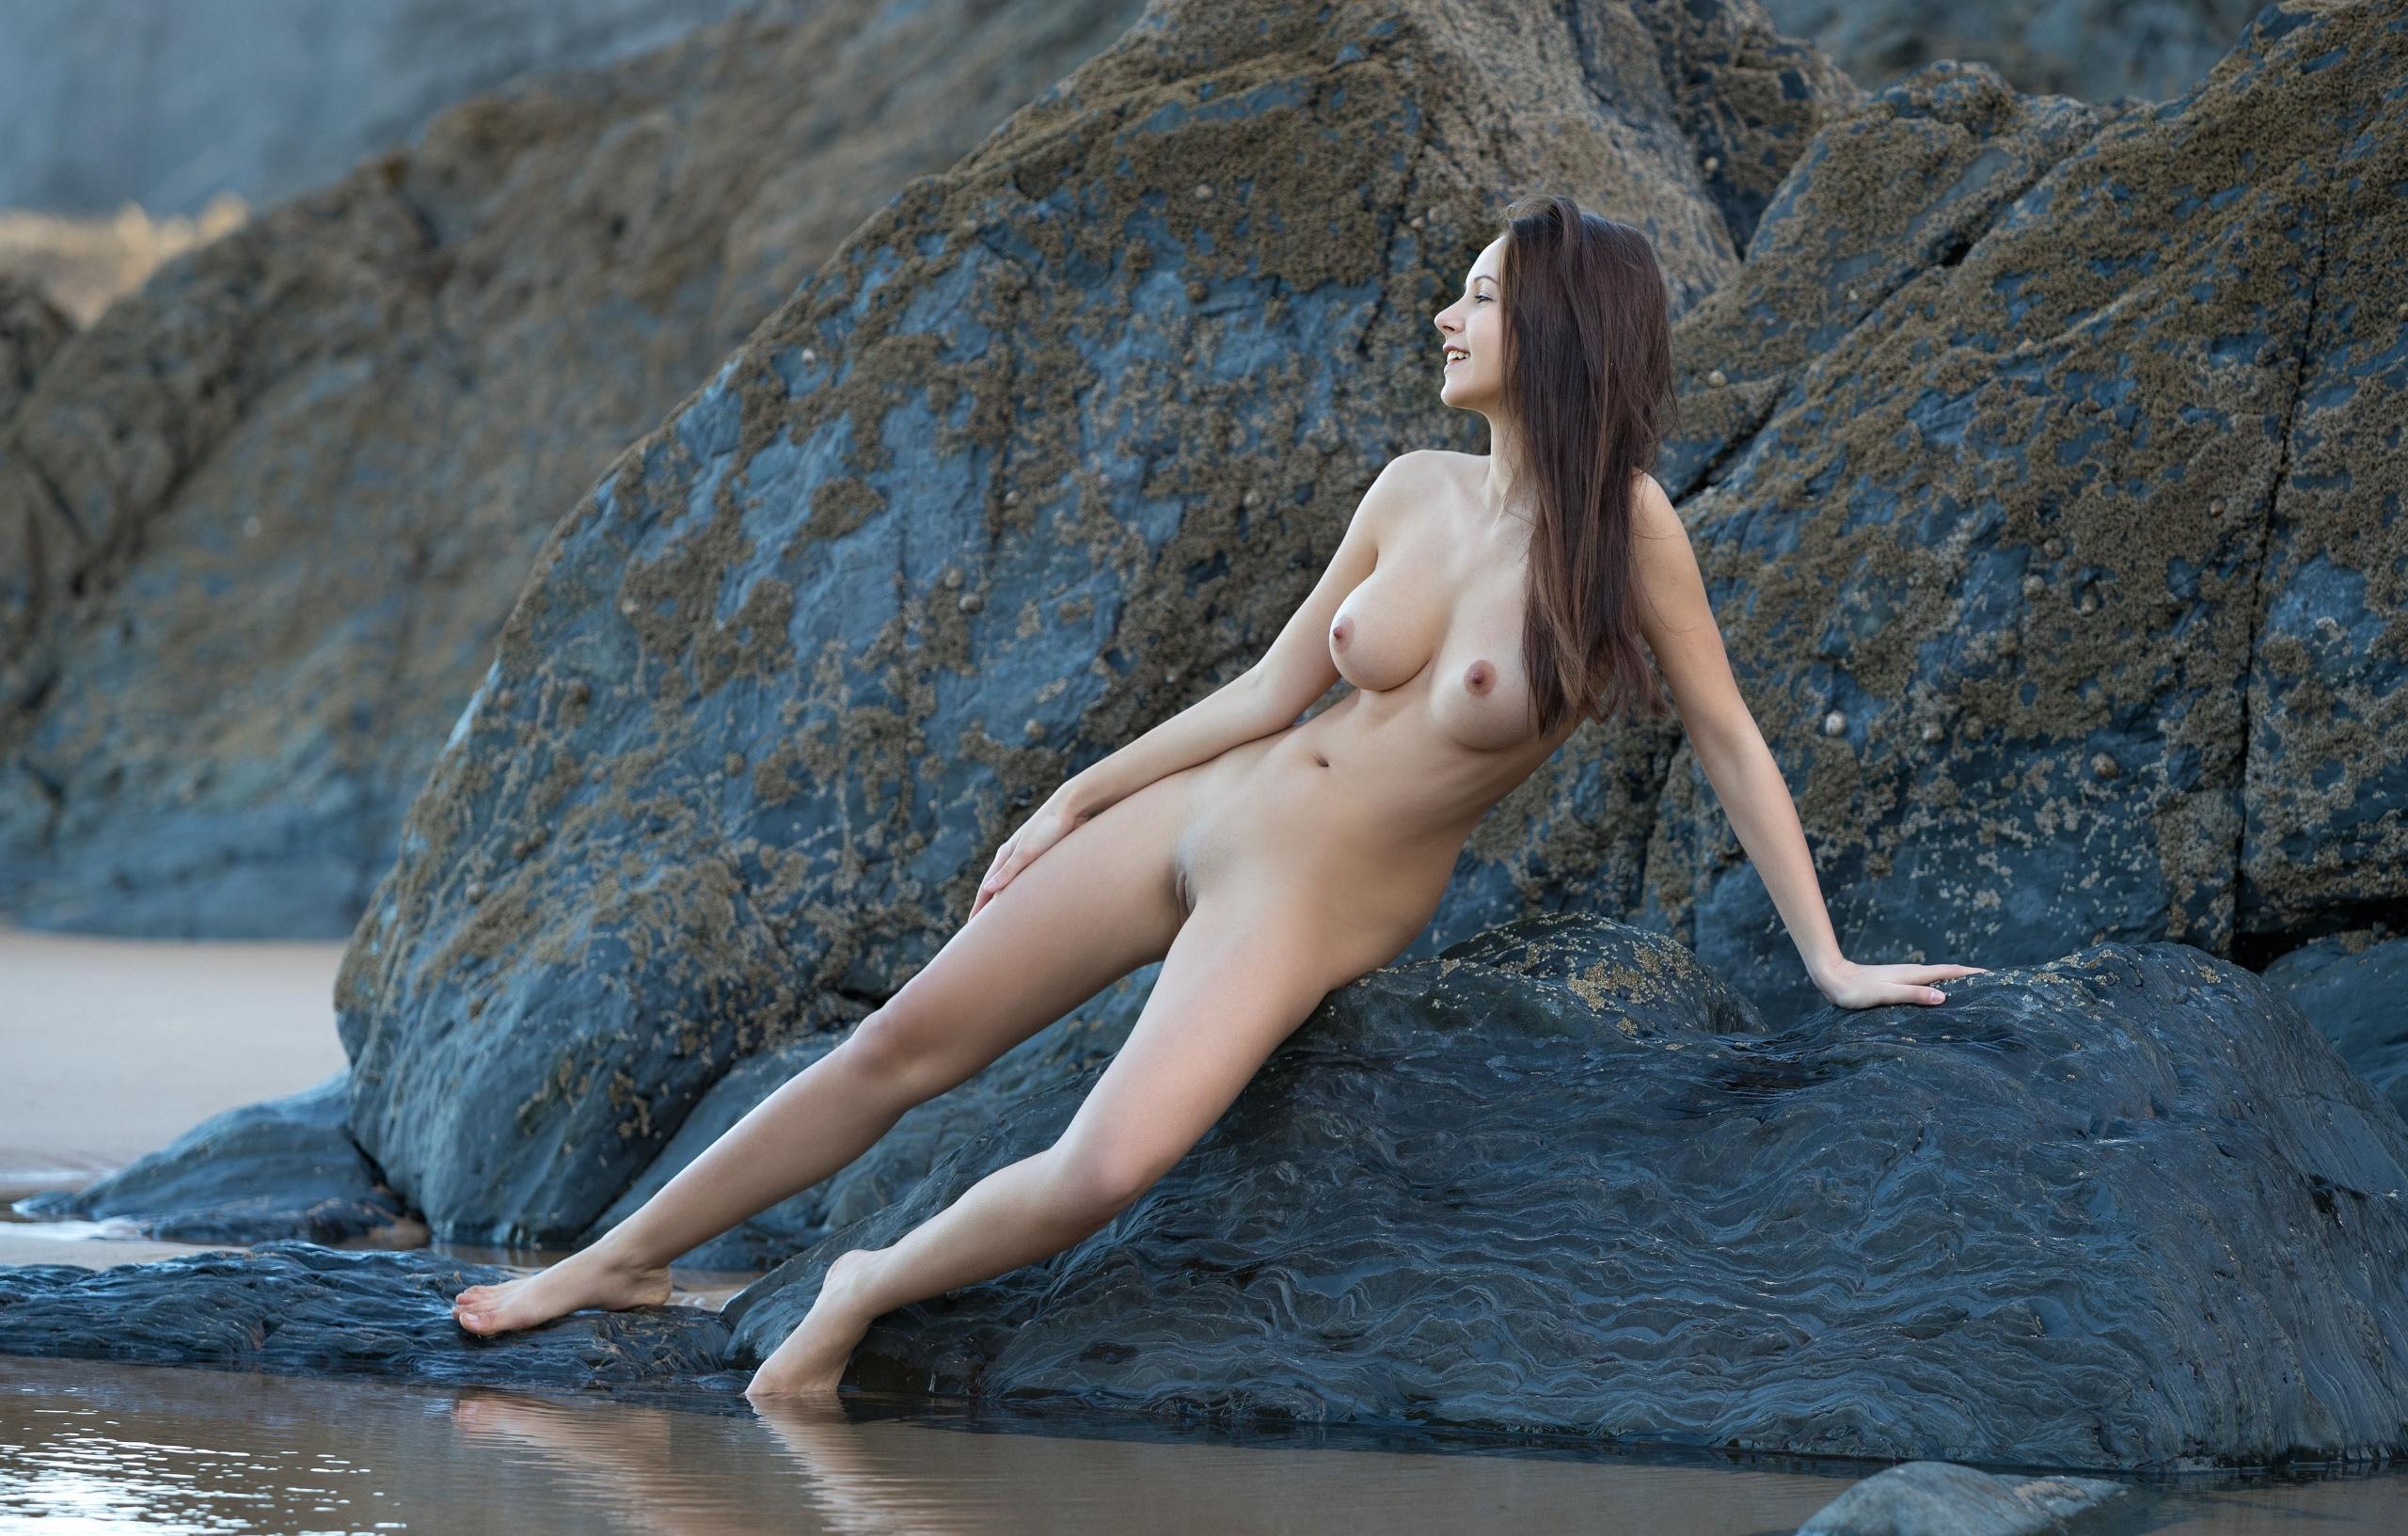 nude wonderful landscapes, feel - sunflower22a | ello